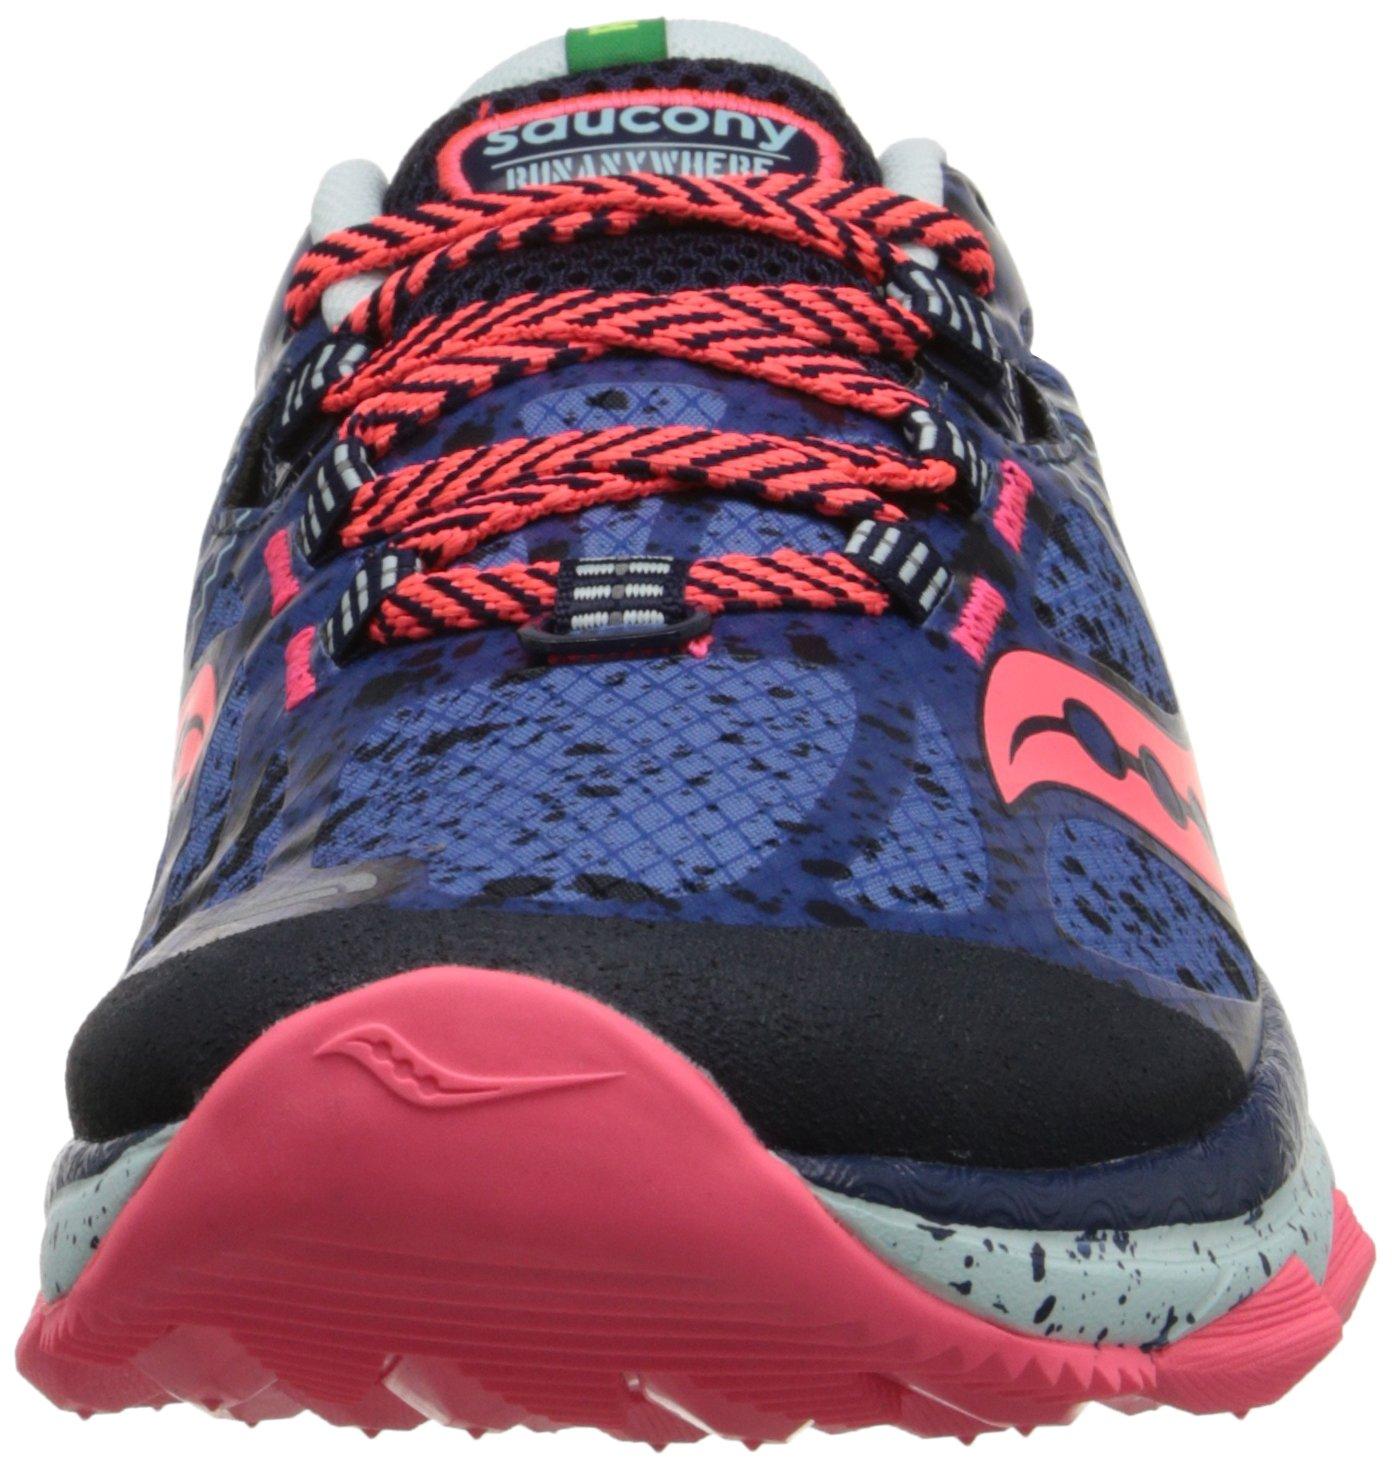 Saucony Women's Nomad TR Trail Running Shoe B00PJ8U9E0 6.5 B(M) US|Blue/Navy